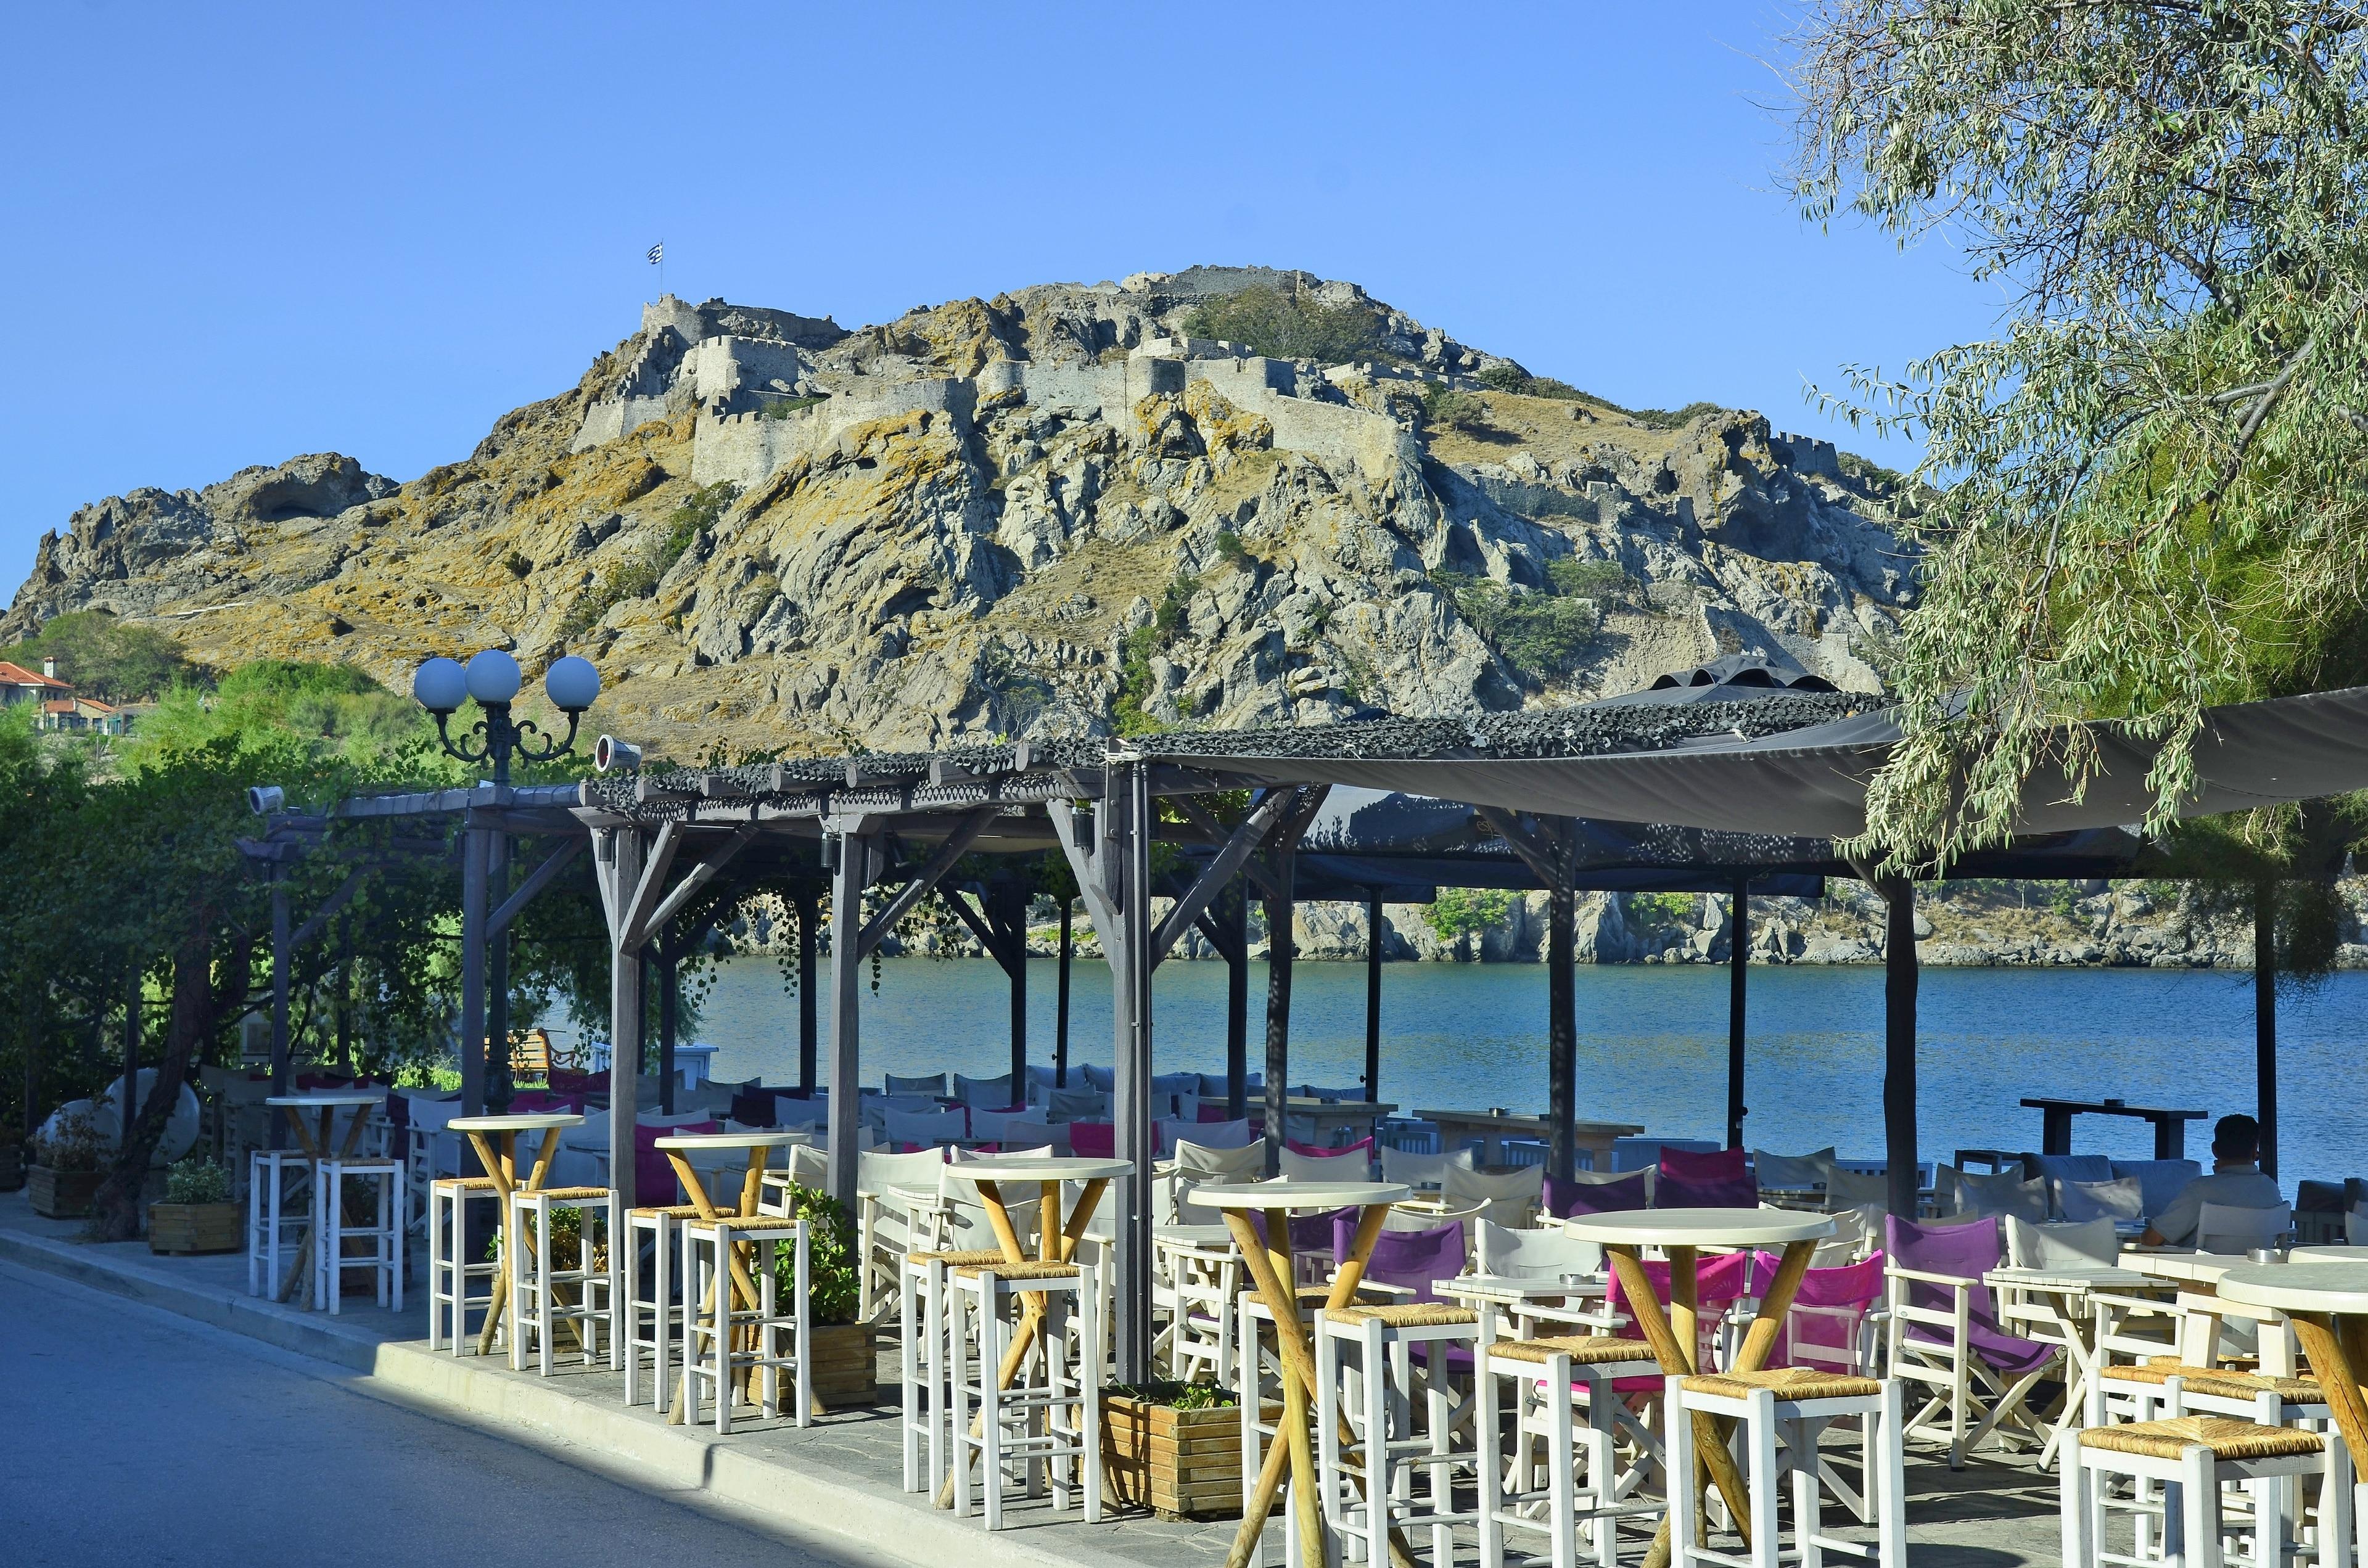 Lemnos, North Aegean Islands, Greece